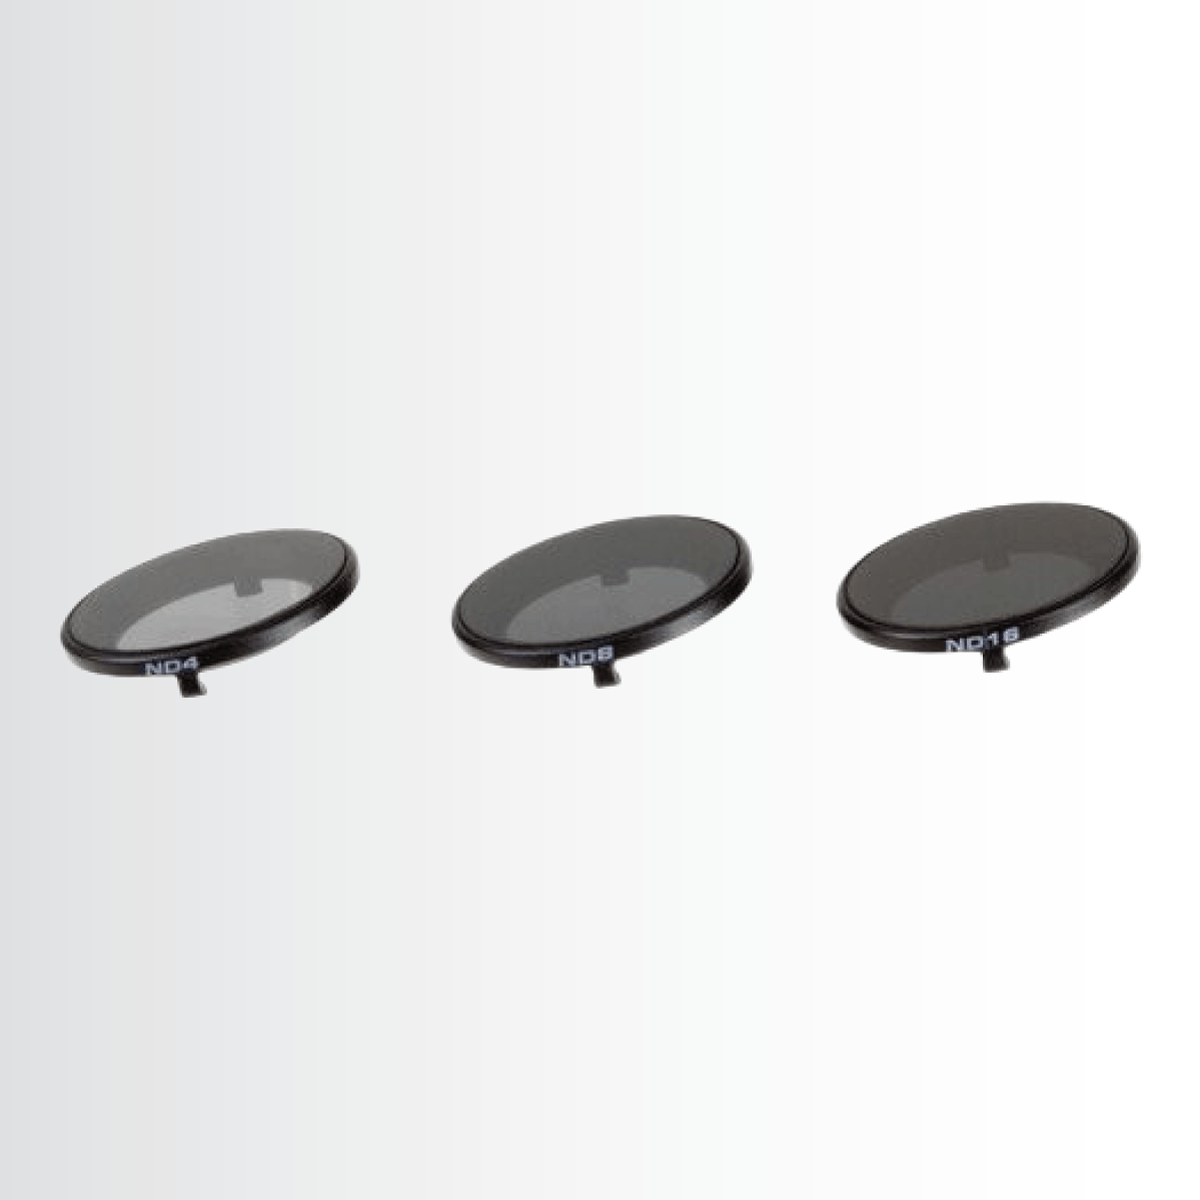 lens-polarpo-filters-Bundle-luxe-thyphoon-H-realsense-verydrone